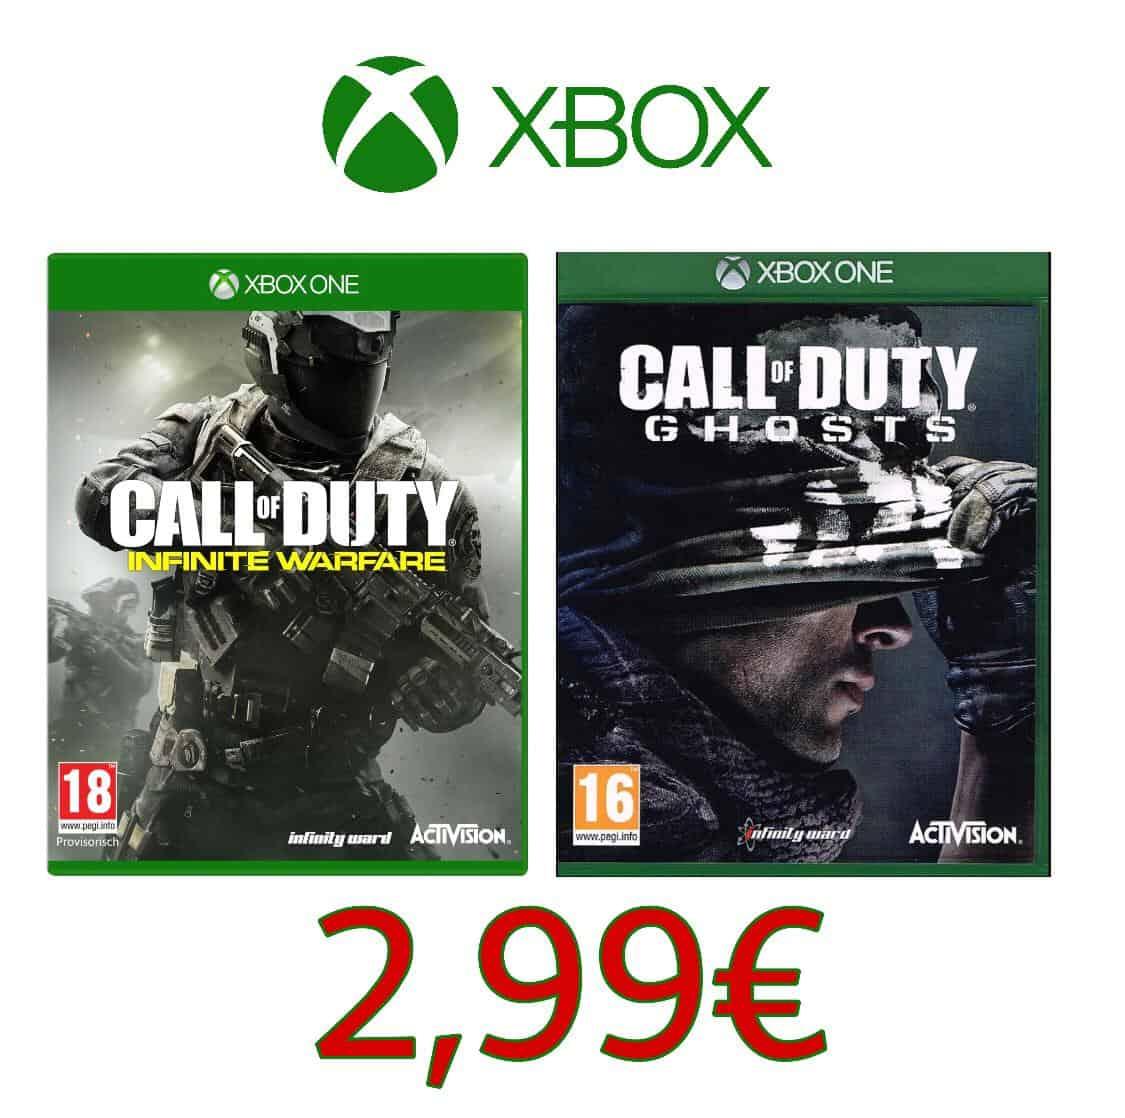 Call of Duty: Infinite Warfare + Call Of Duty: Ghosts (Xbox One) @ Gamesflat